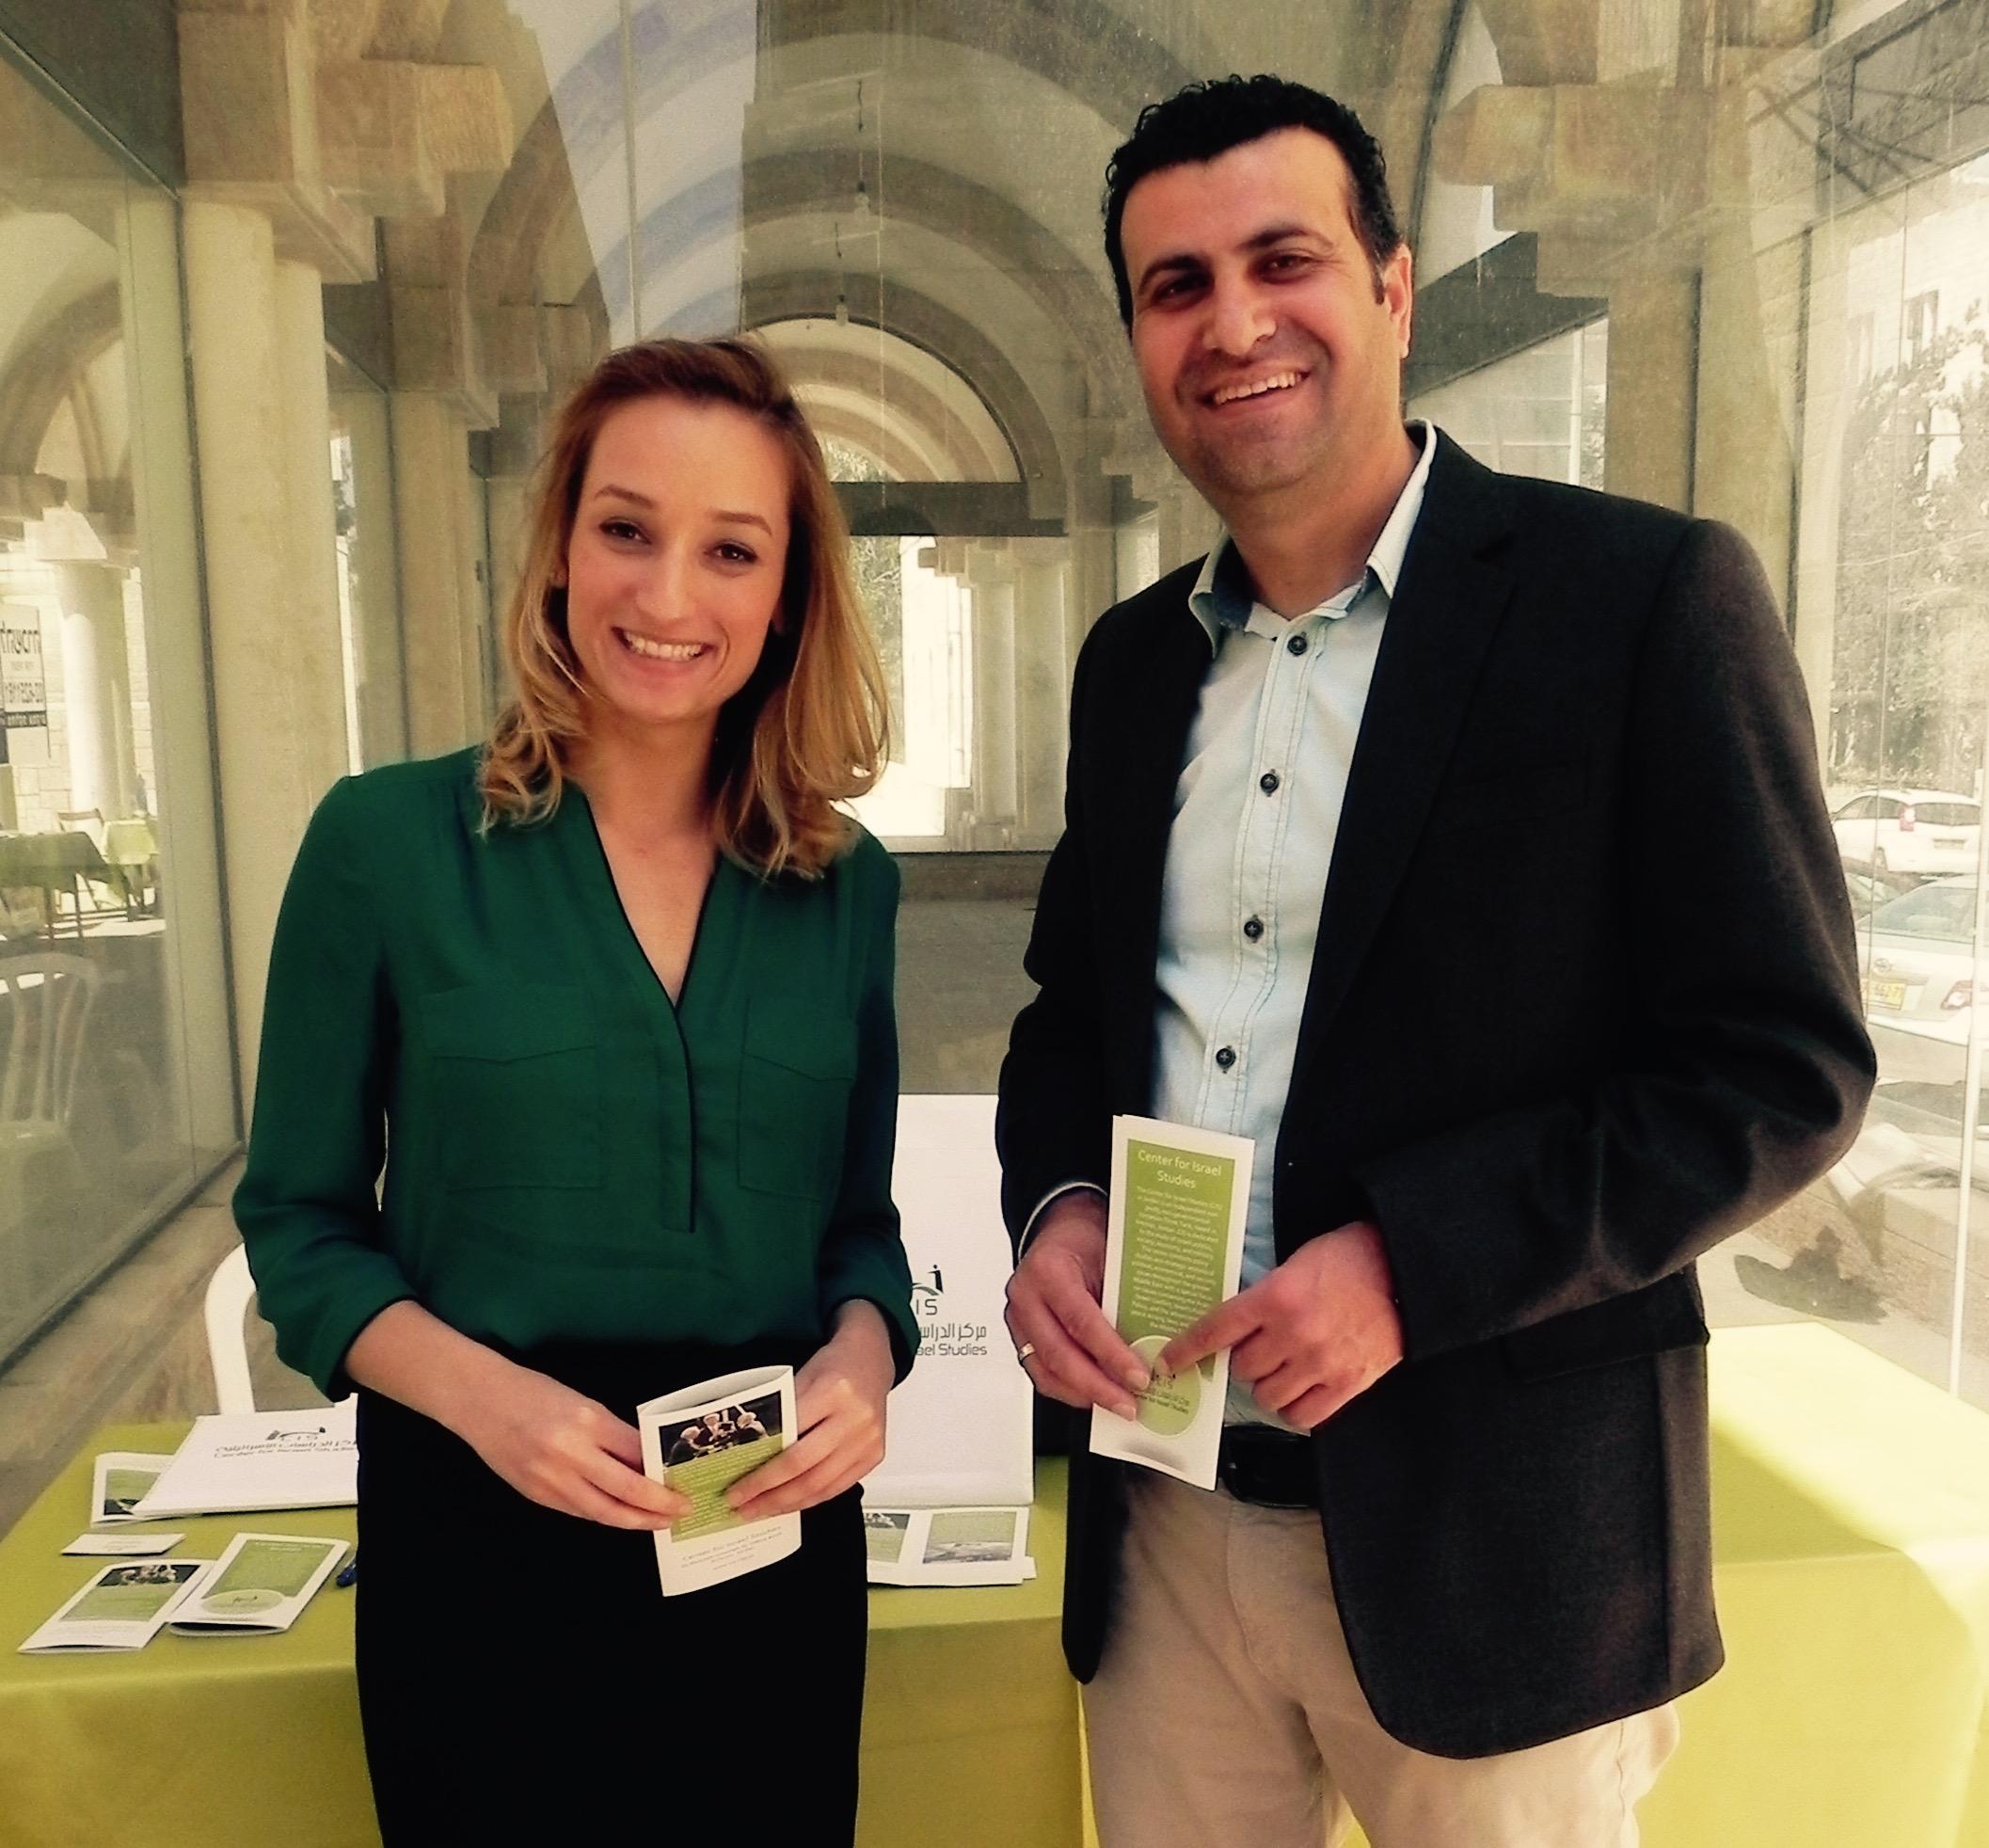 Shirin Lotfi with Dr. Swalha of CIS Jordan.